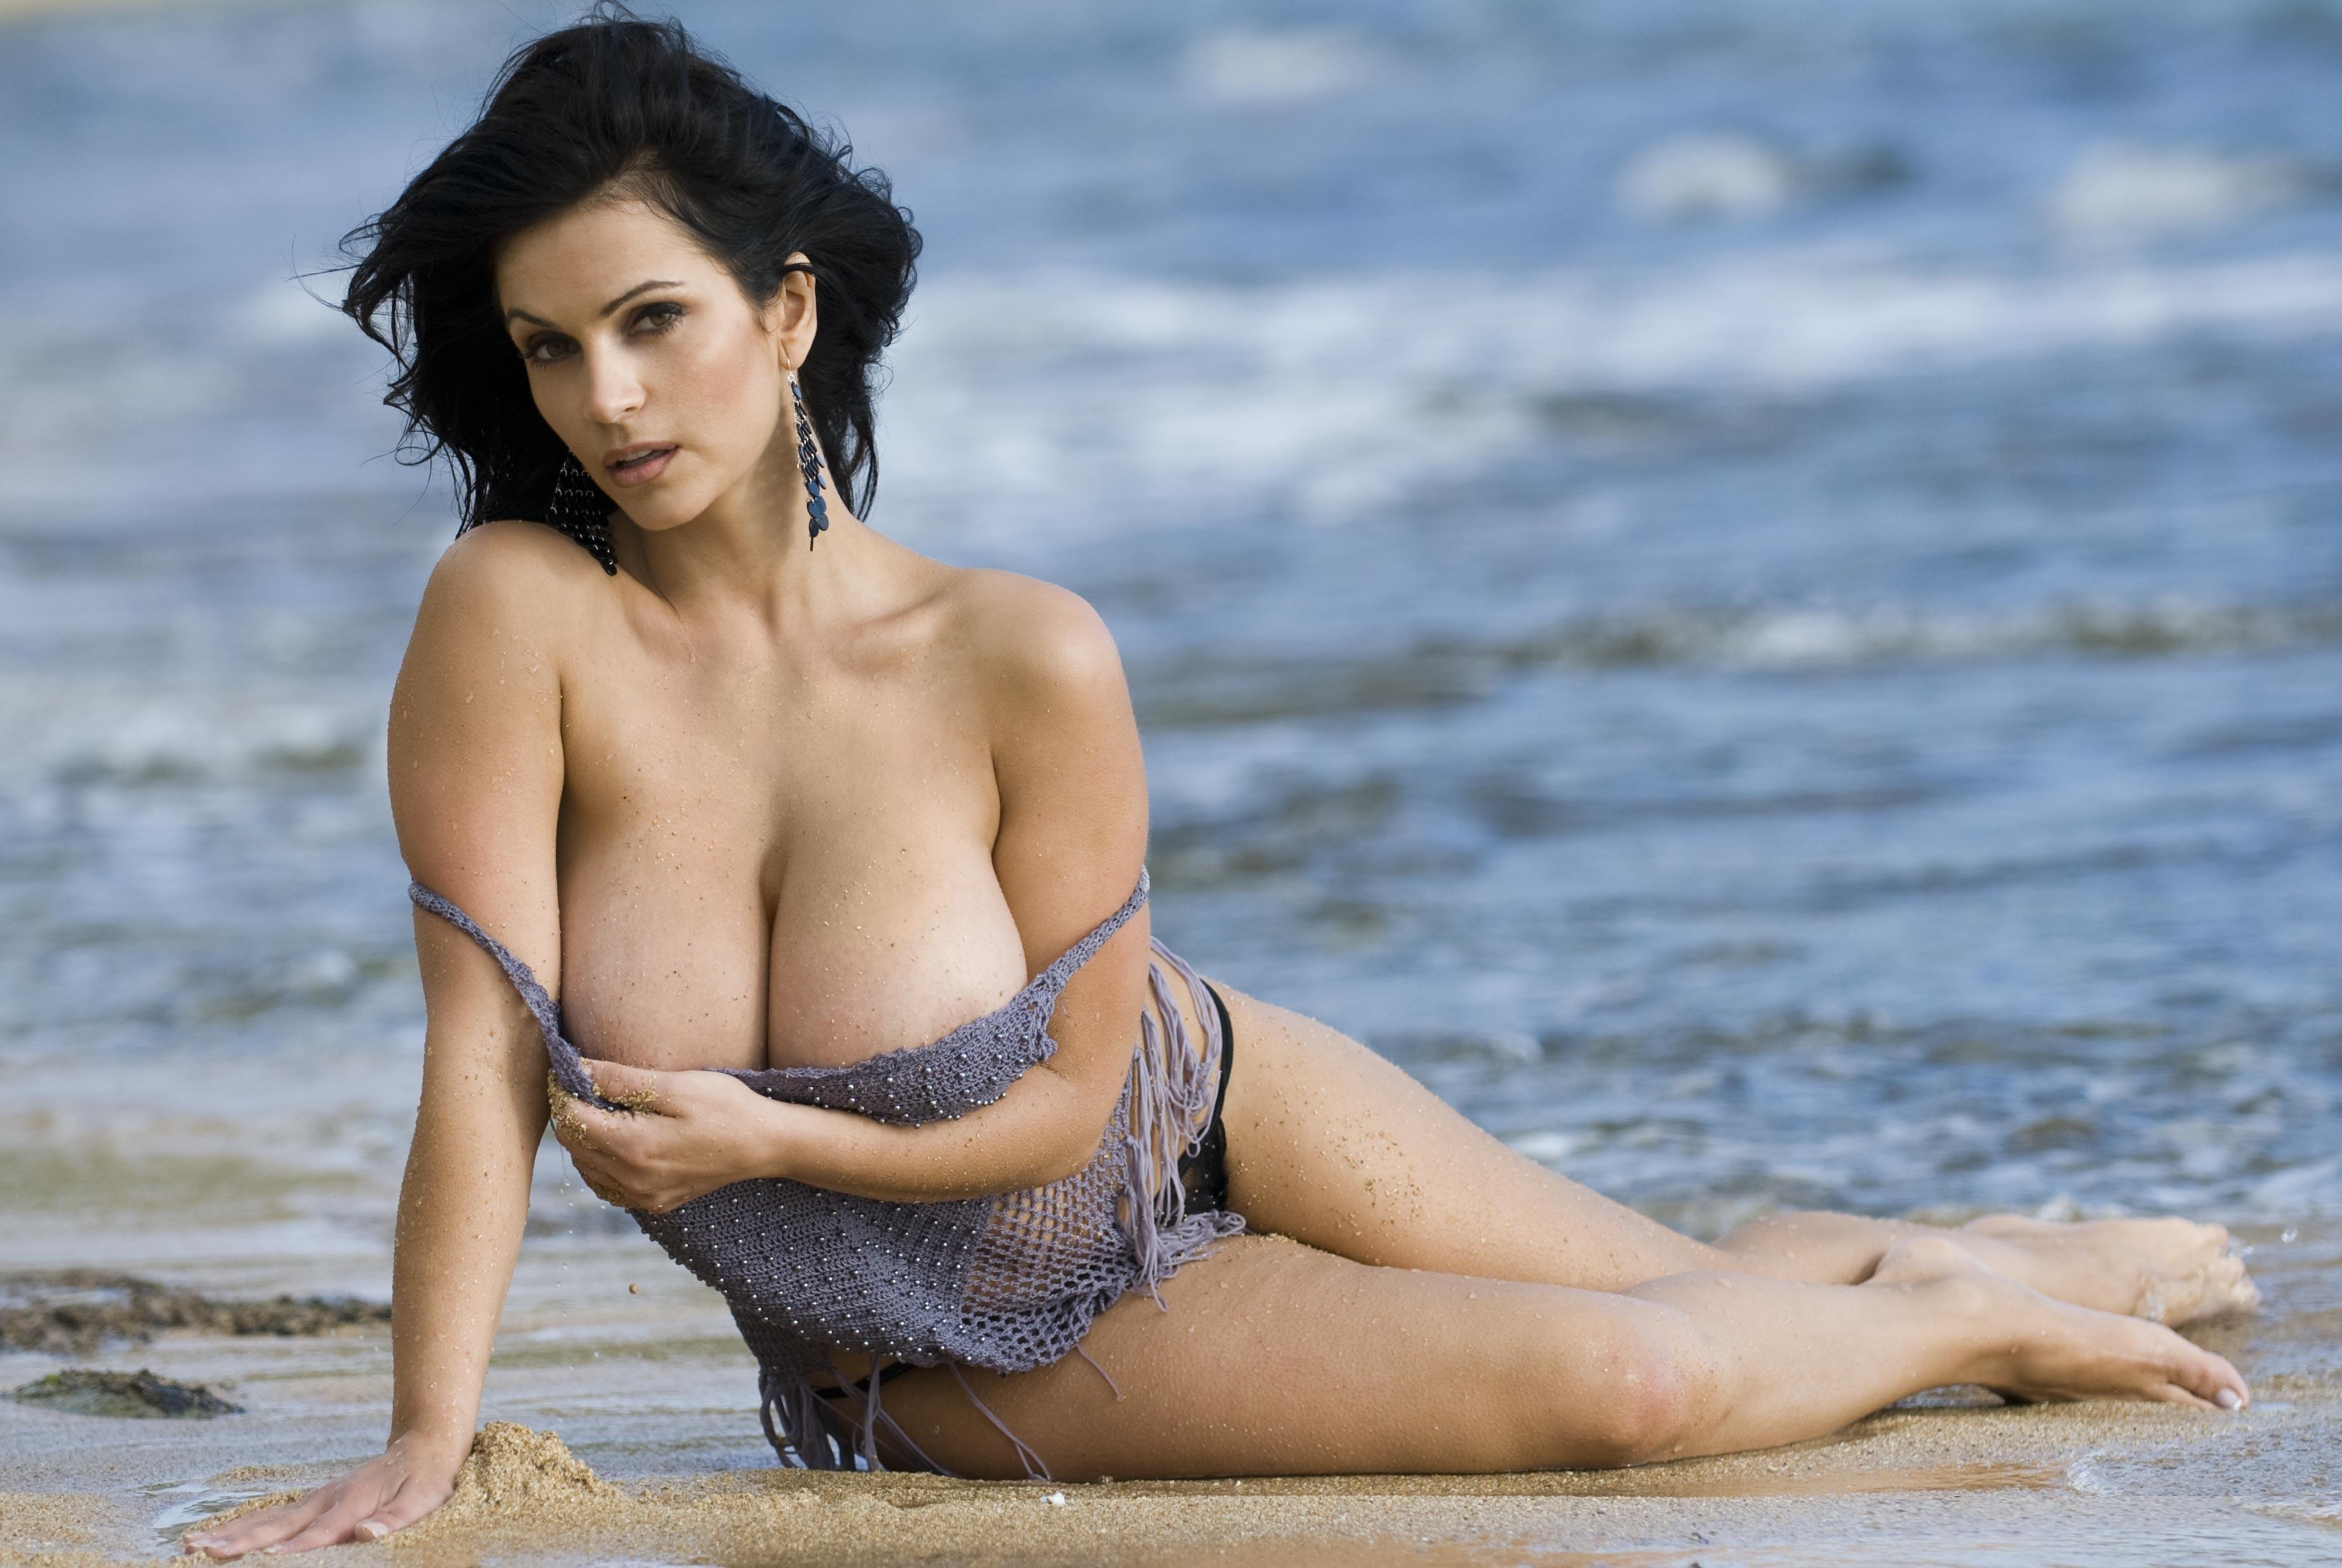 Wallpaper Denise Milani, Model, Brunette, Amazing, Sexy -9549